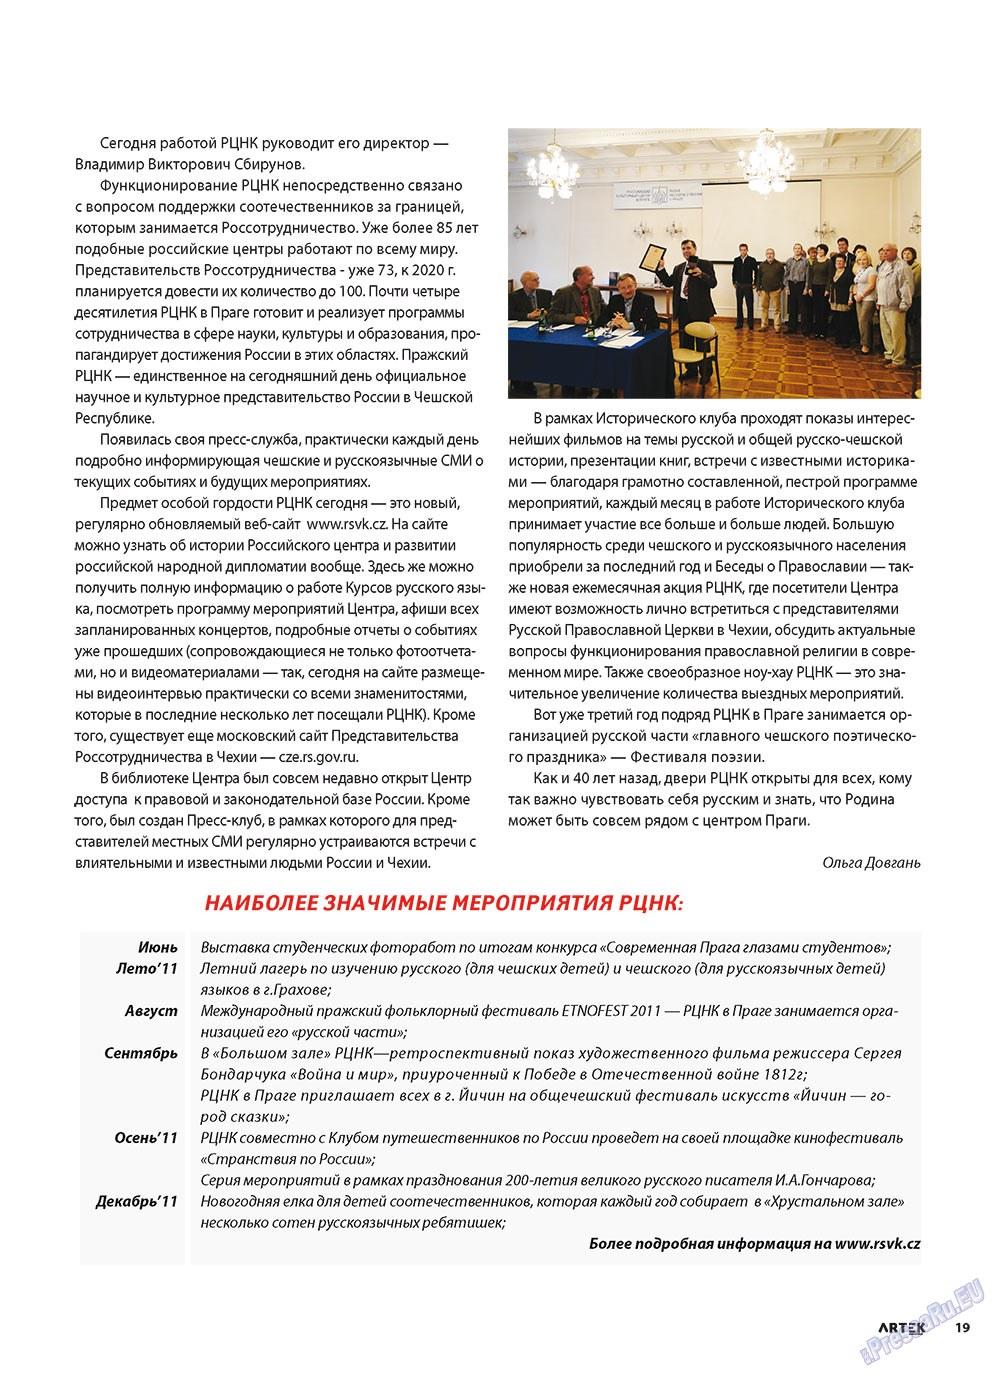 Артек (журнал). 2011 год, номер 2, стр. 21